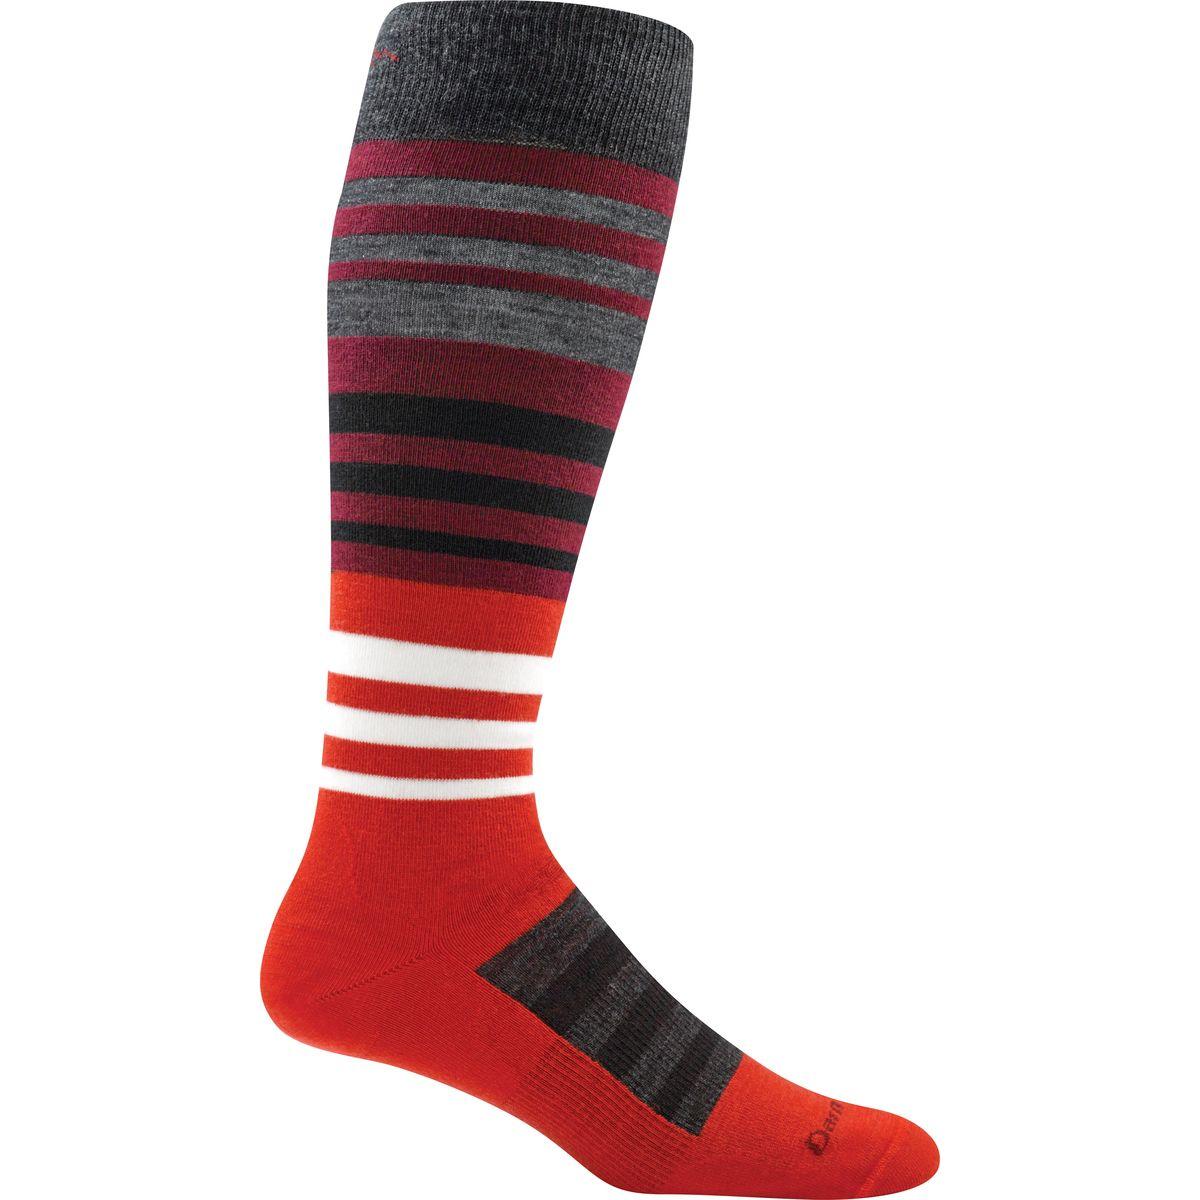 Hojo OTC Cushion Sock - Men